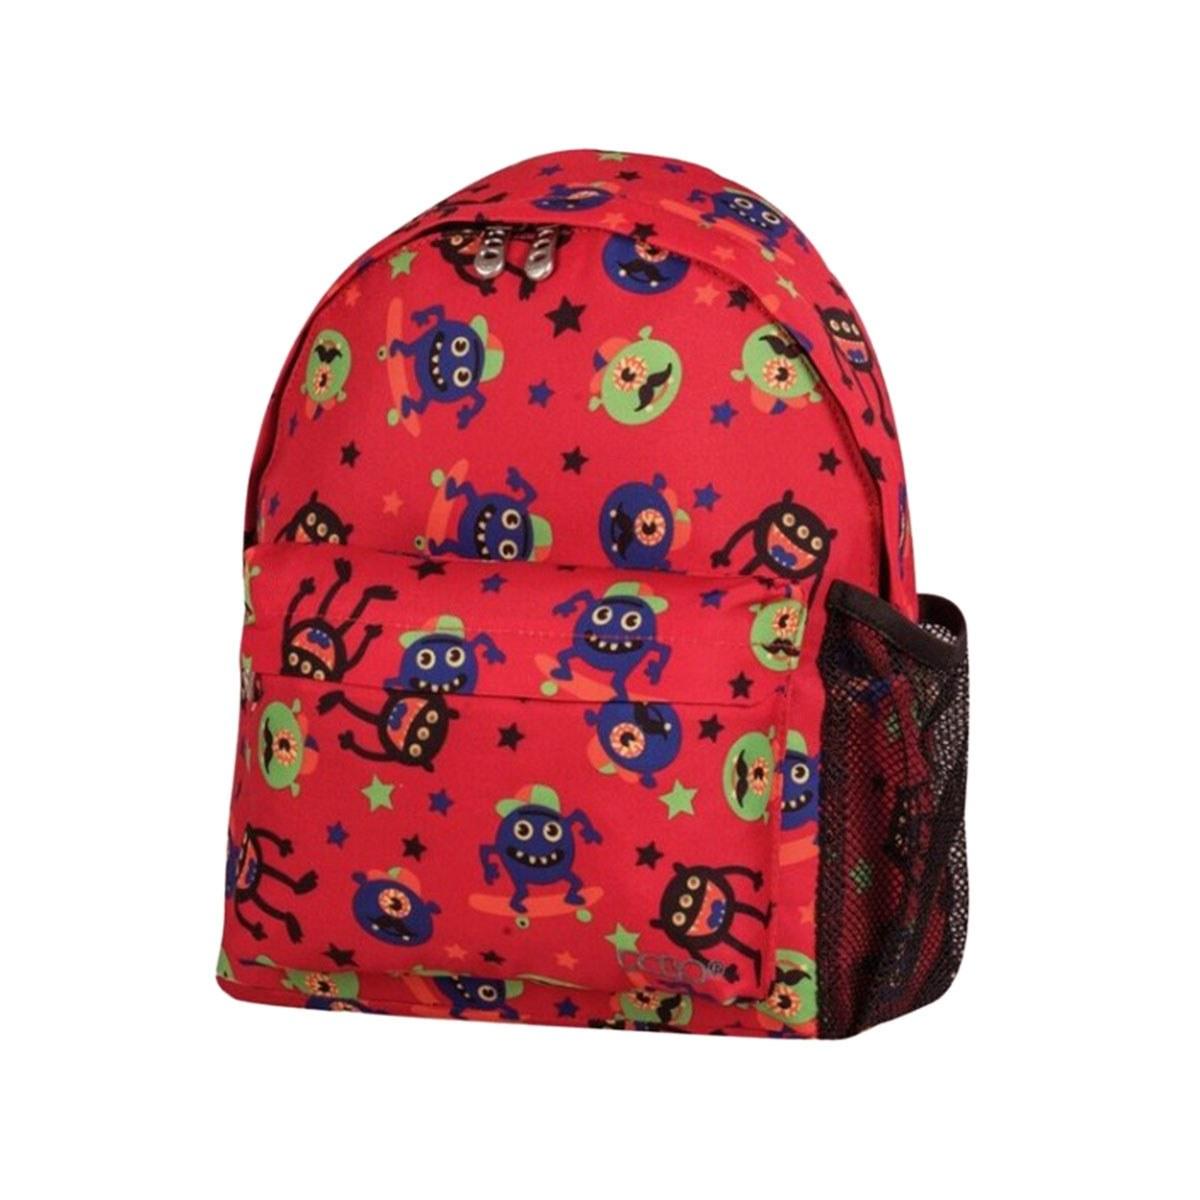 97c08c71128 Σχολικό Σακίδιο Πλάτης Νηπιαγωγείου Polo Backpack Mini 9-01-067-63 ...